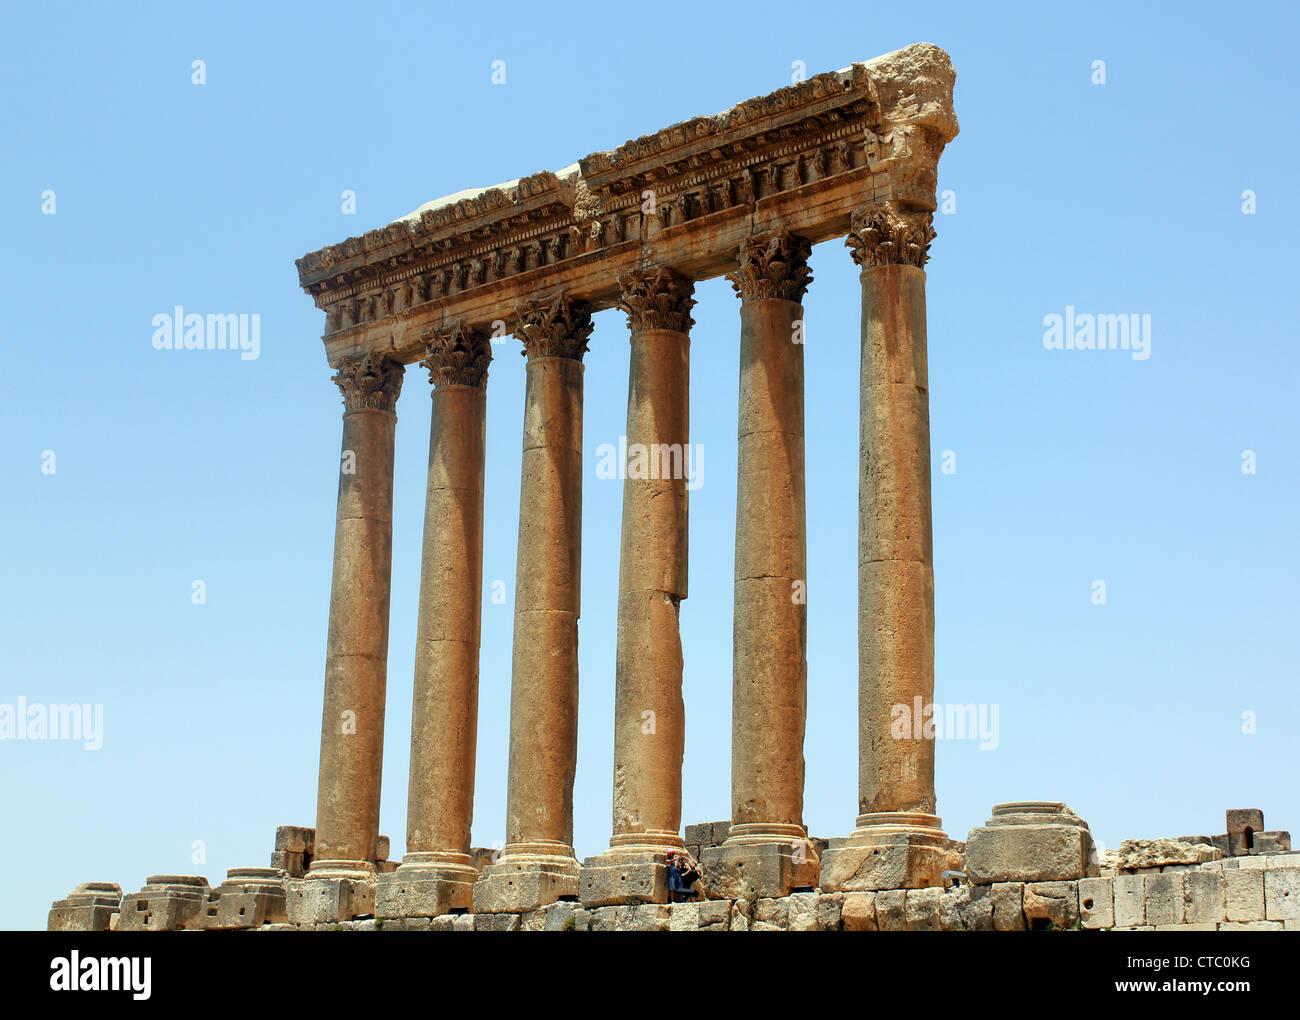 Ruines Romaines de Baalbek, au Liban Photo Stock